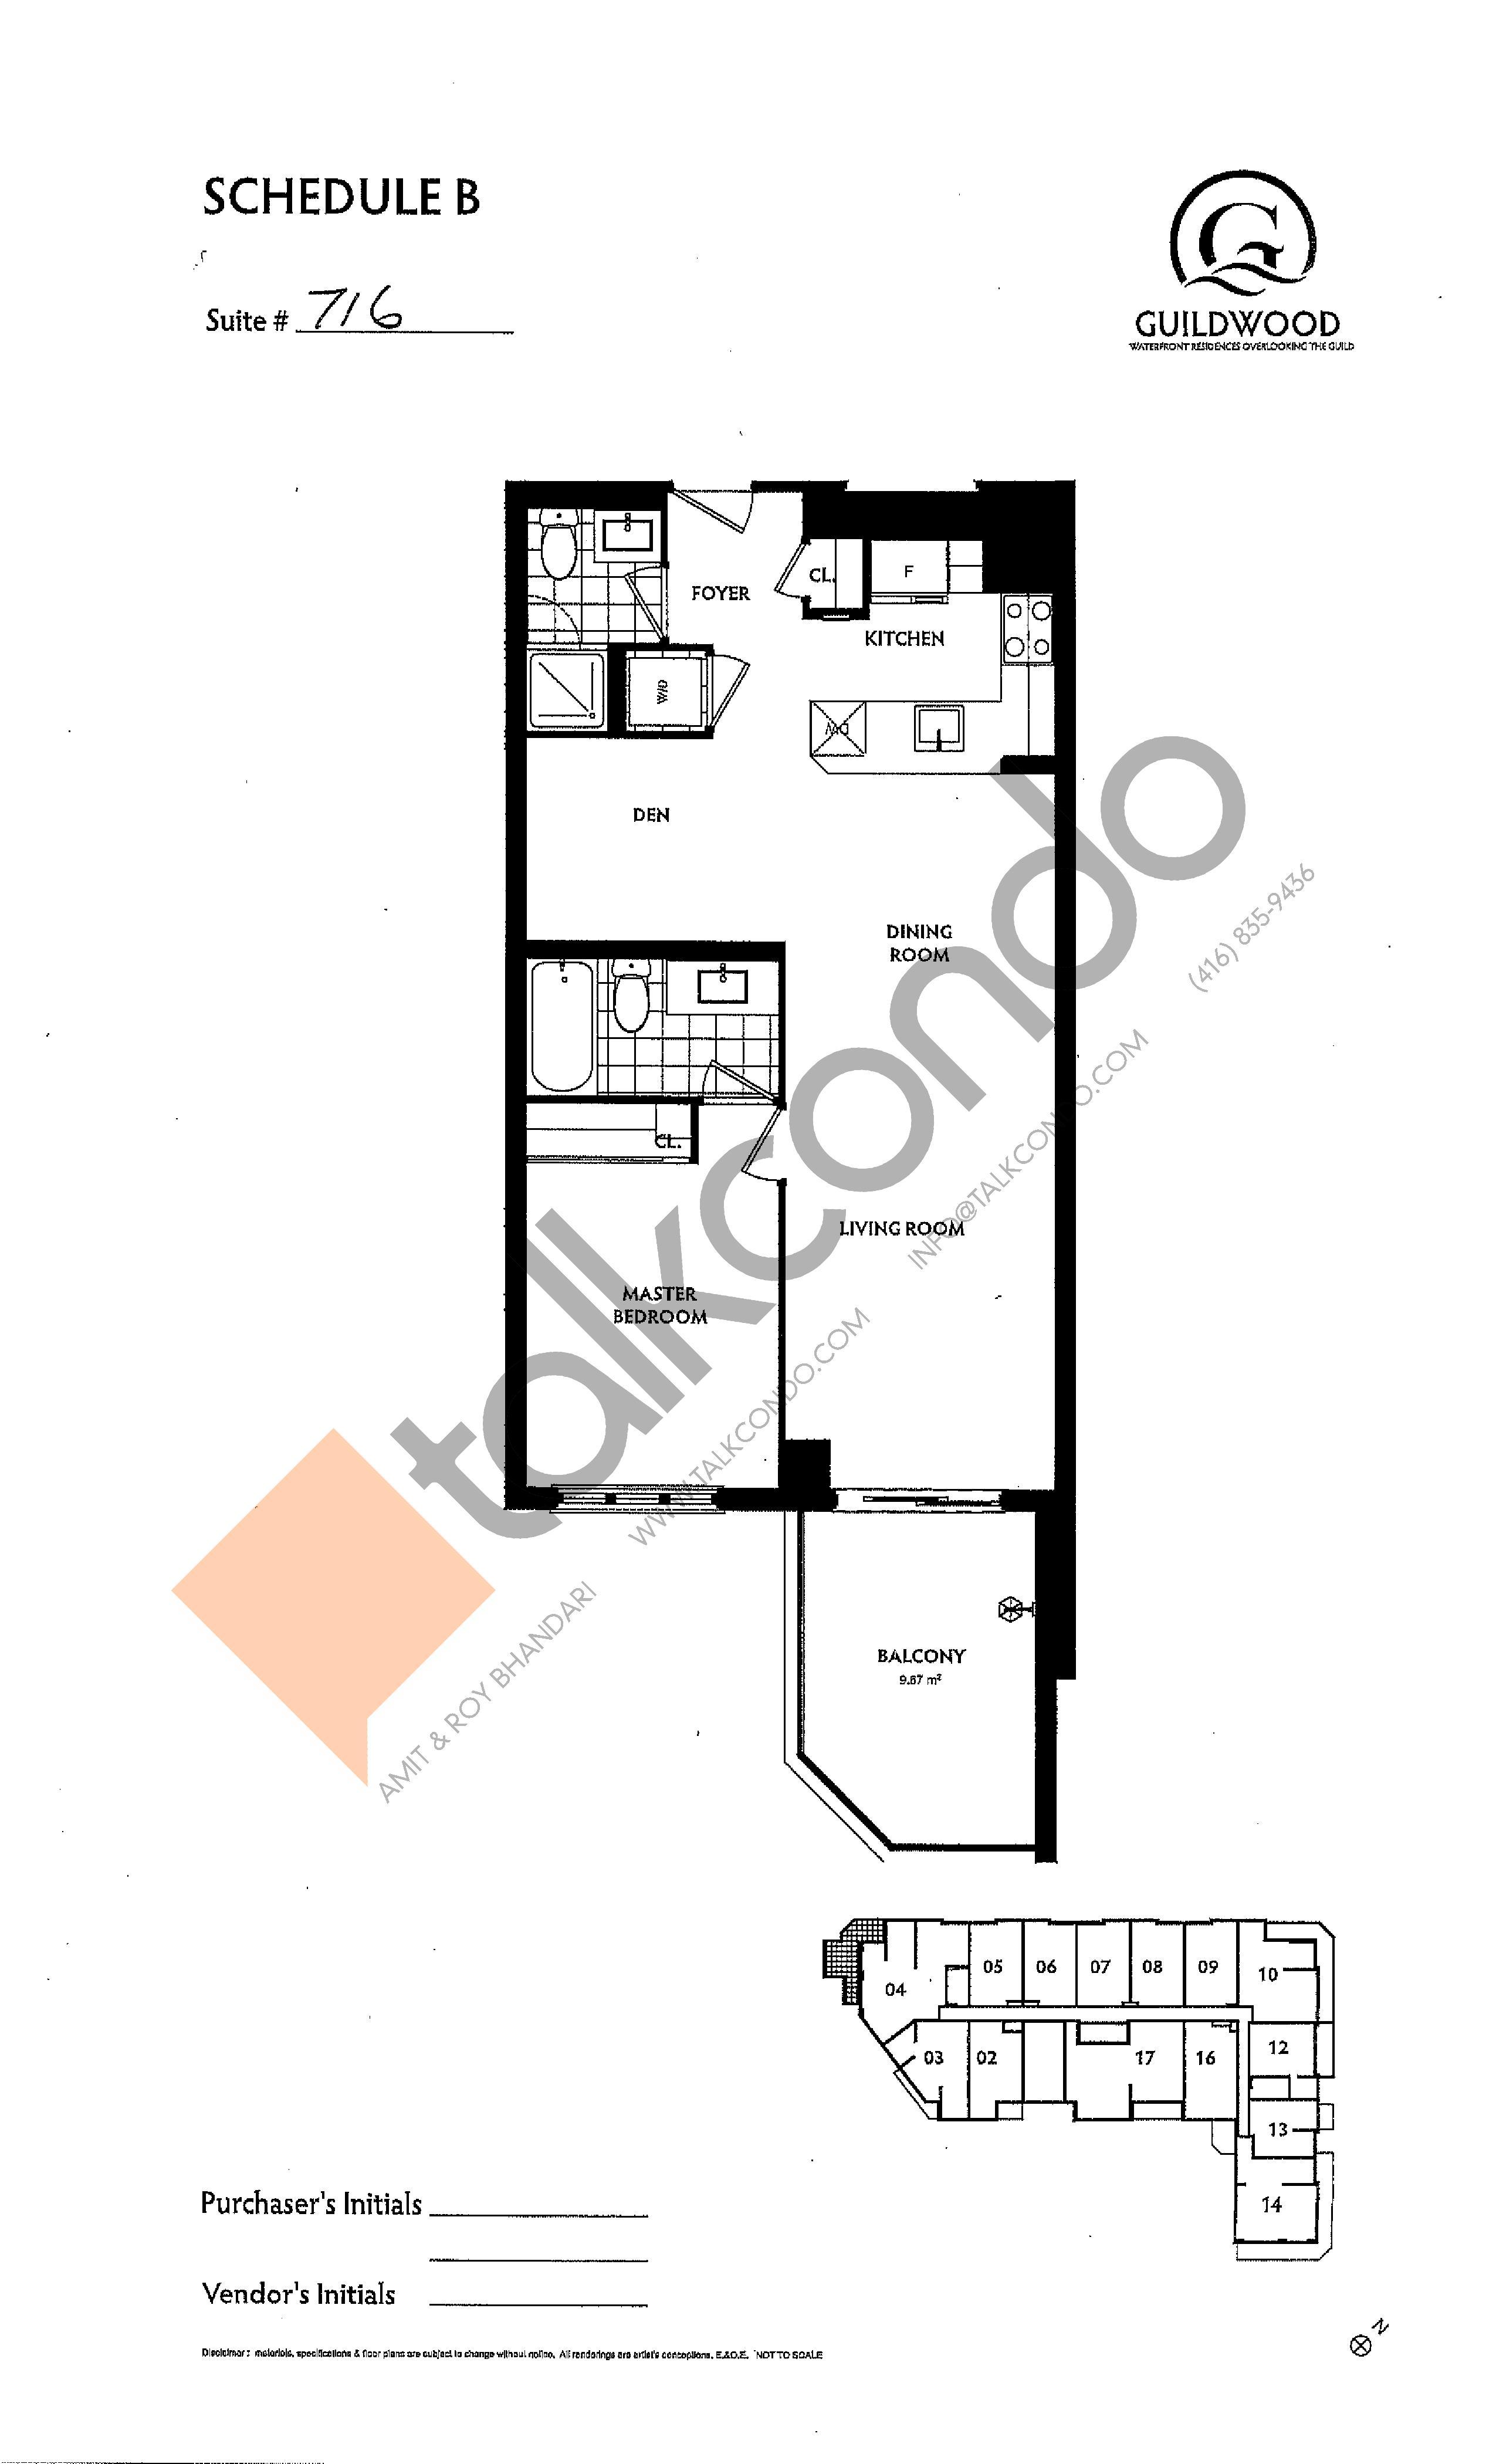 Suite 716 Floor Plan at Guildwood Condos - 760 sq.ft